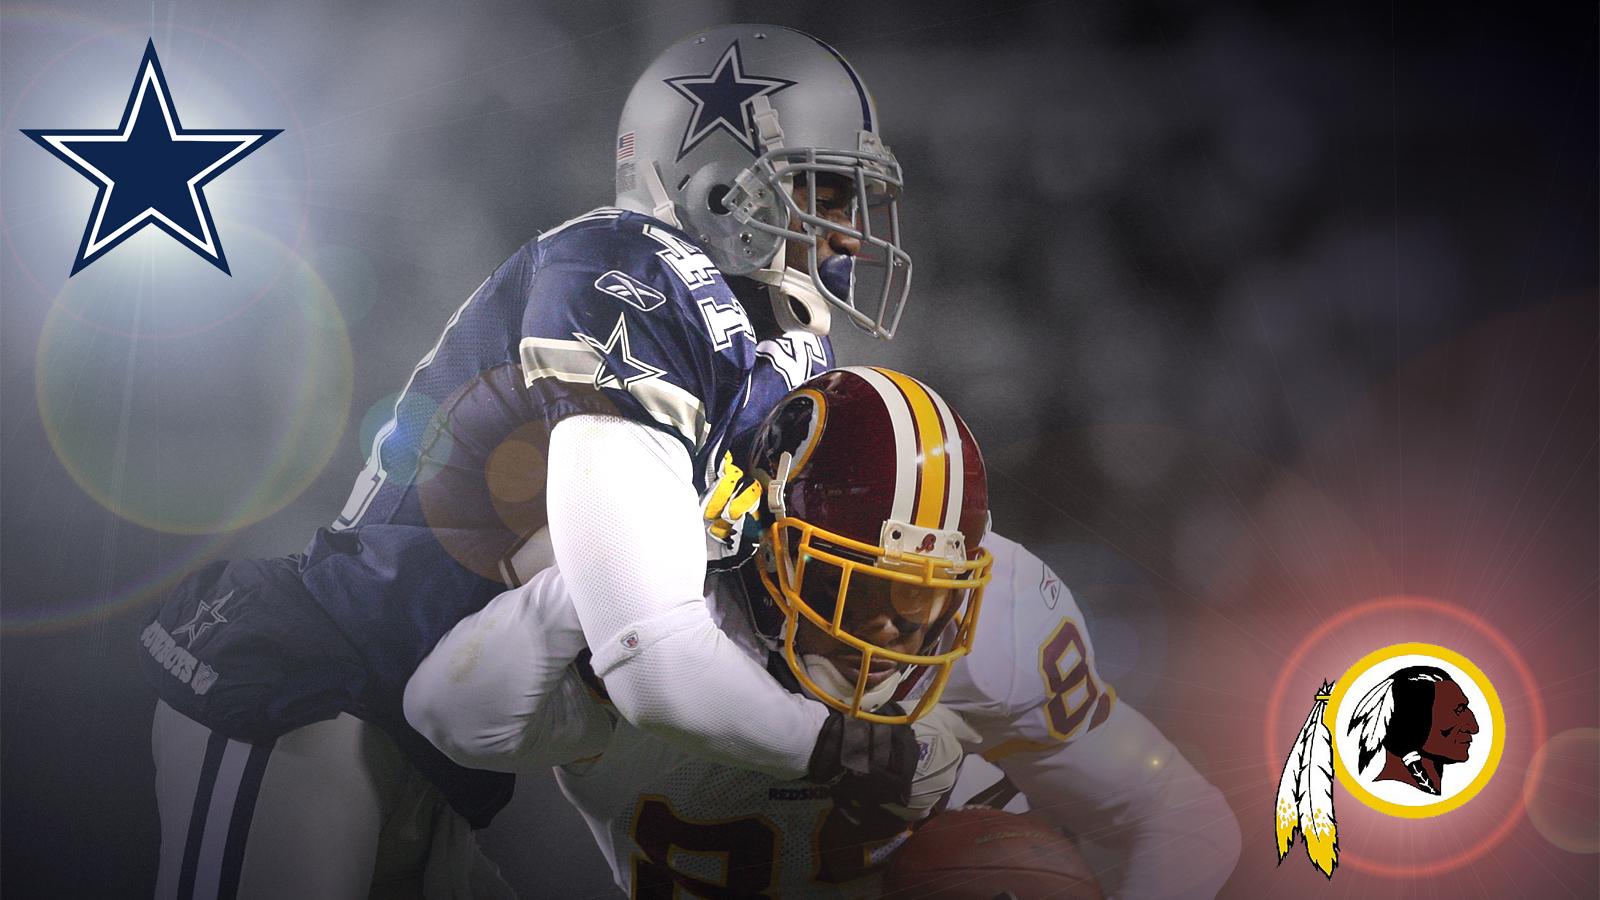 Cowboys - Redskins by jason284